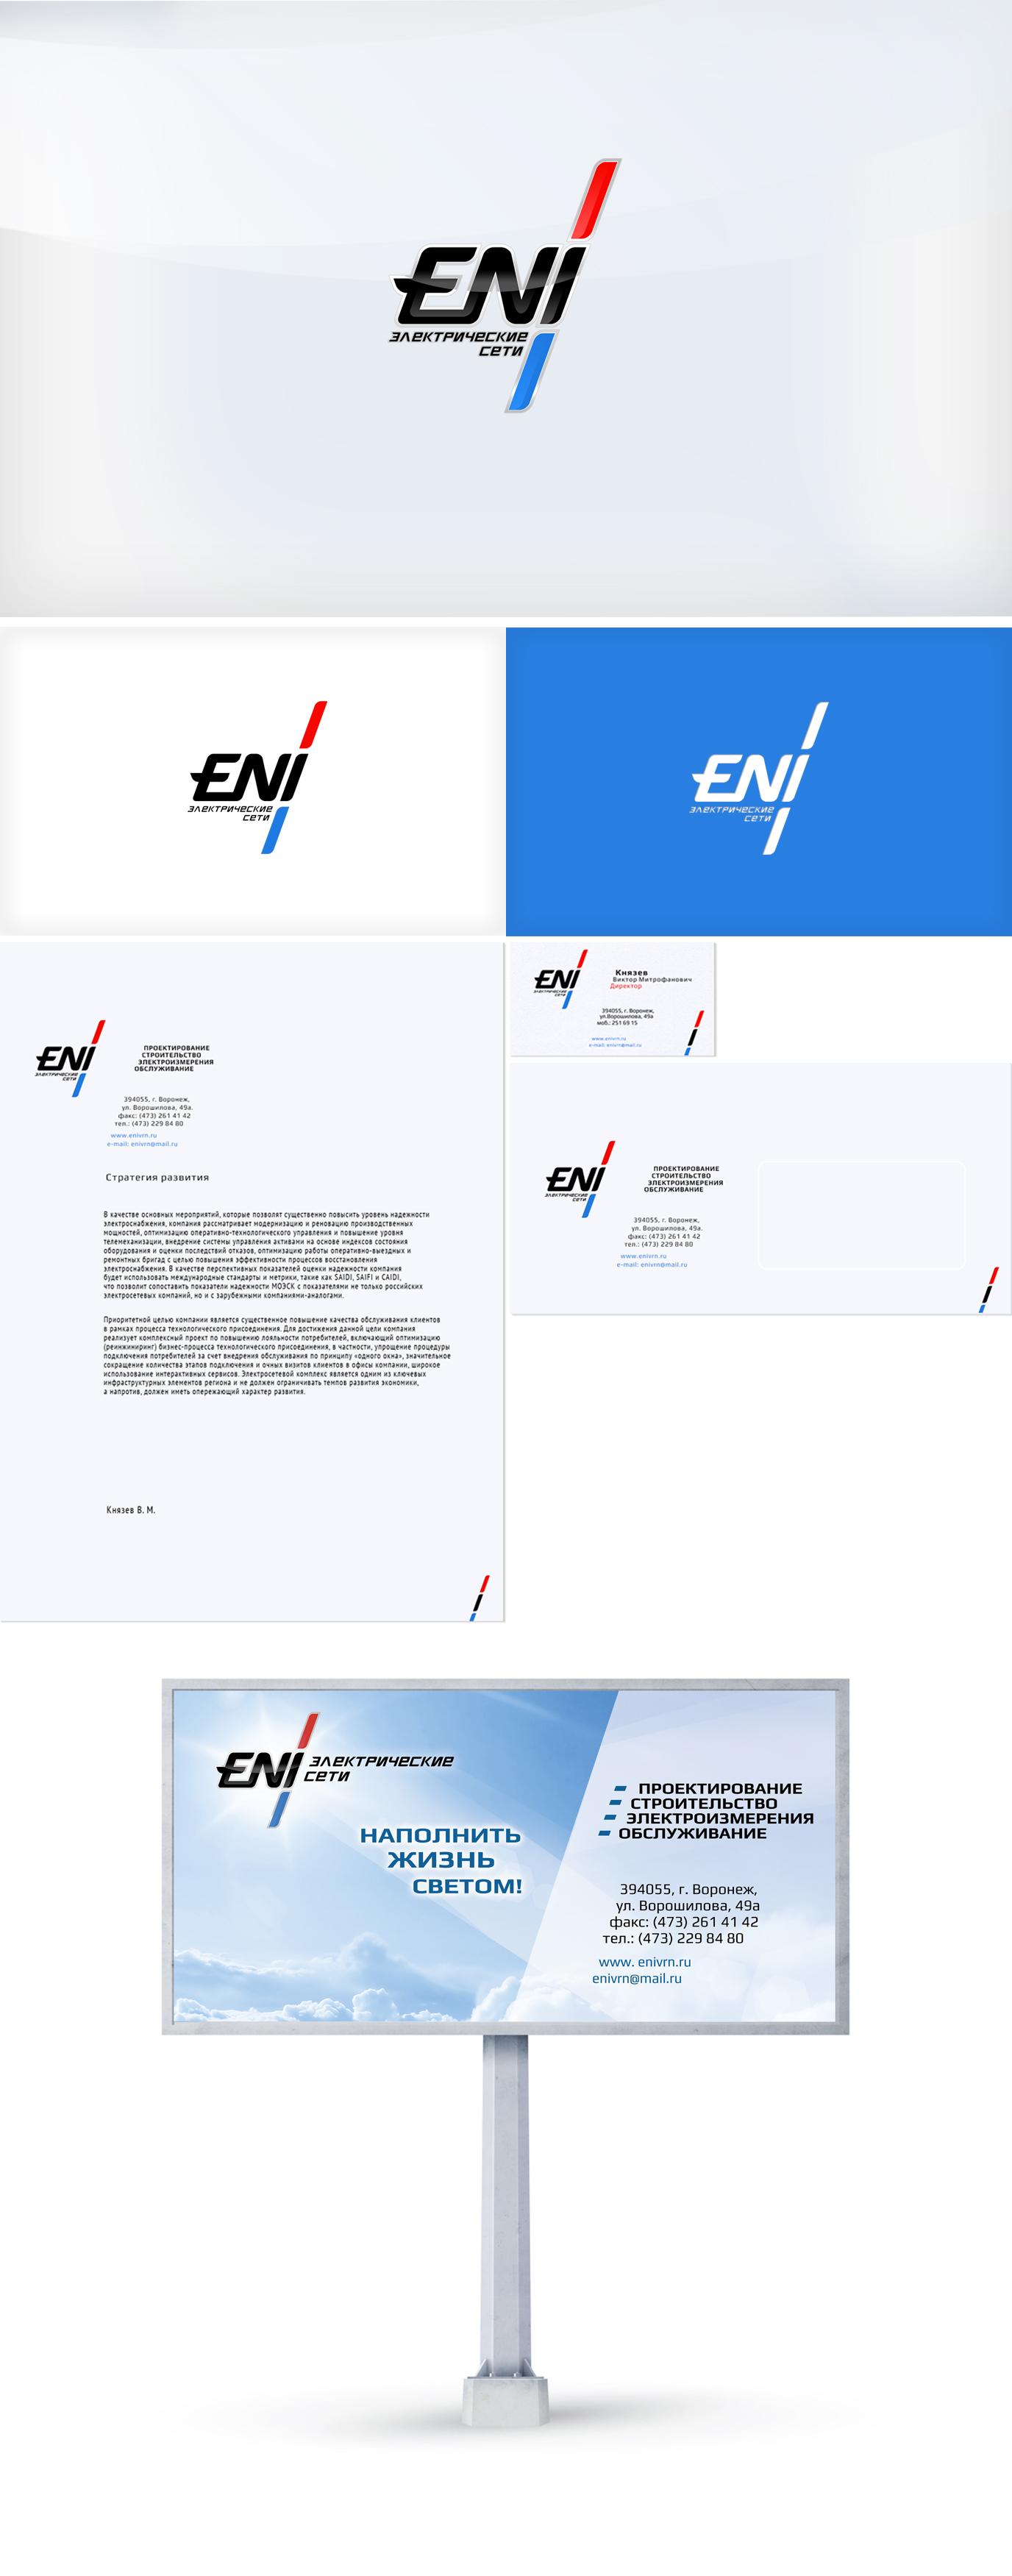 http://id1.ru/wp-content/uploads/2015/09/ENI.jpg